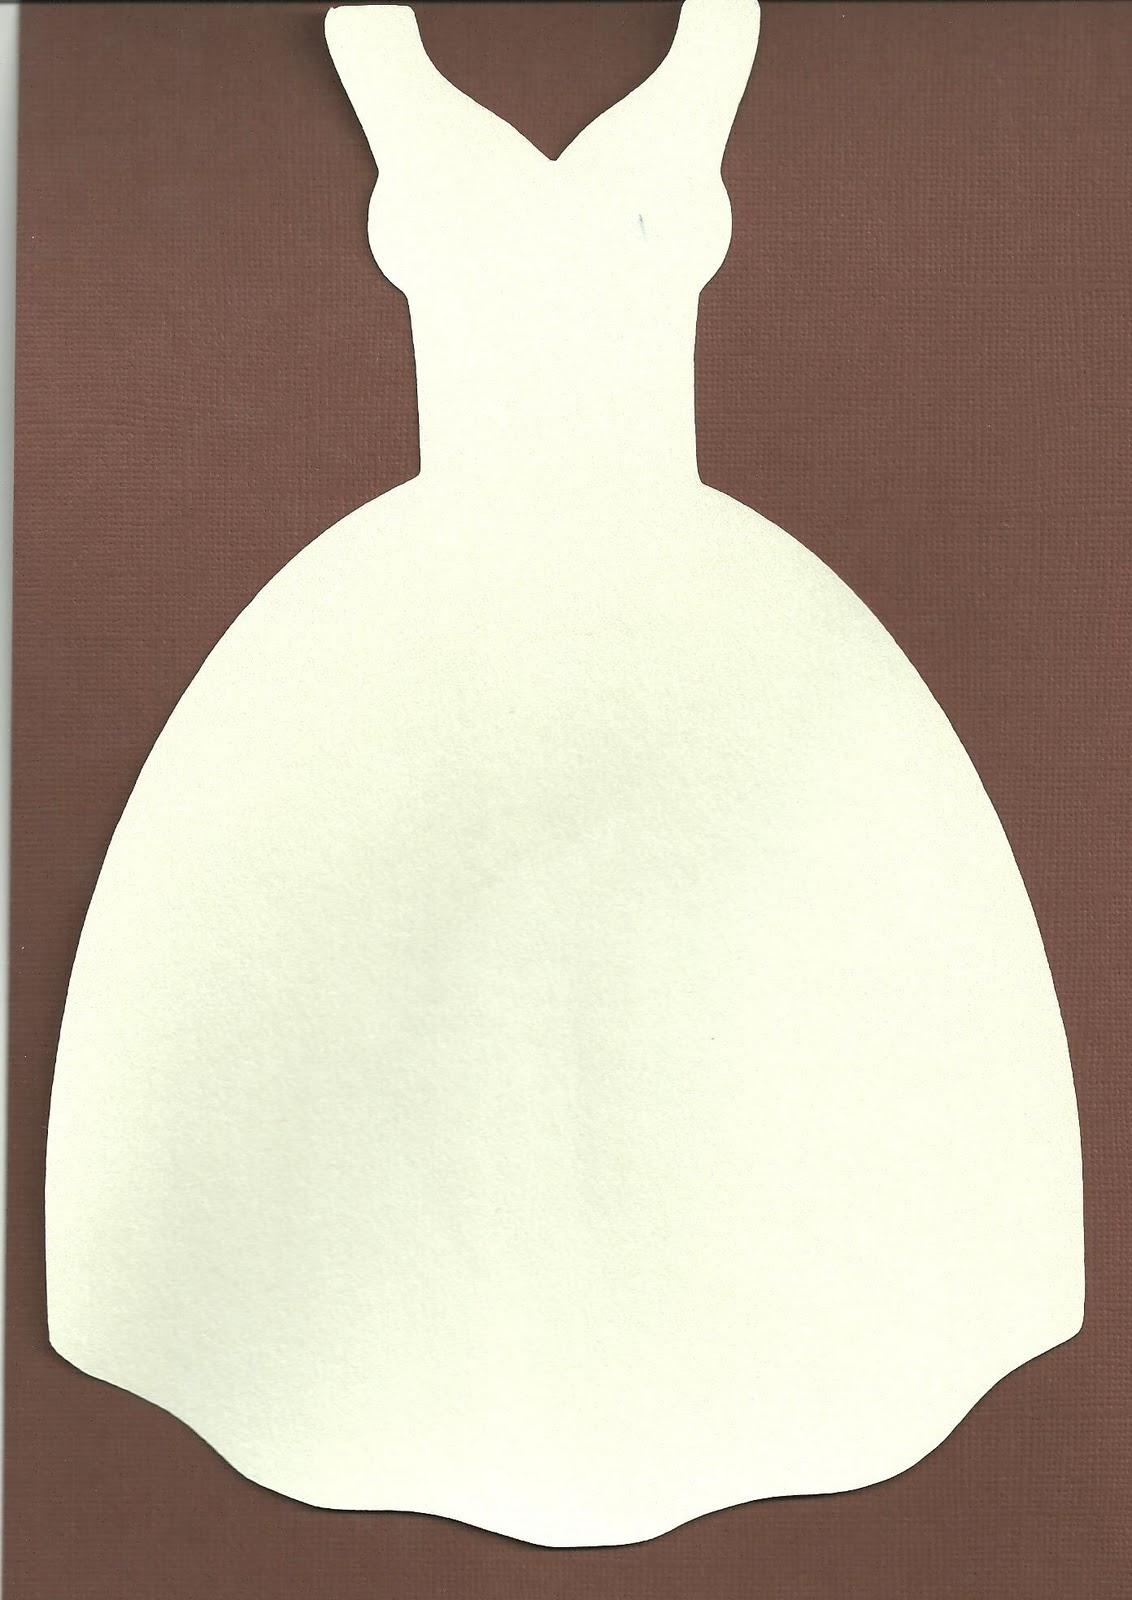 Jennifer collector of hobbies free svg file wedding dress shaped card